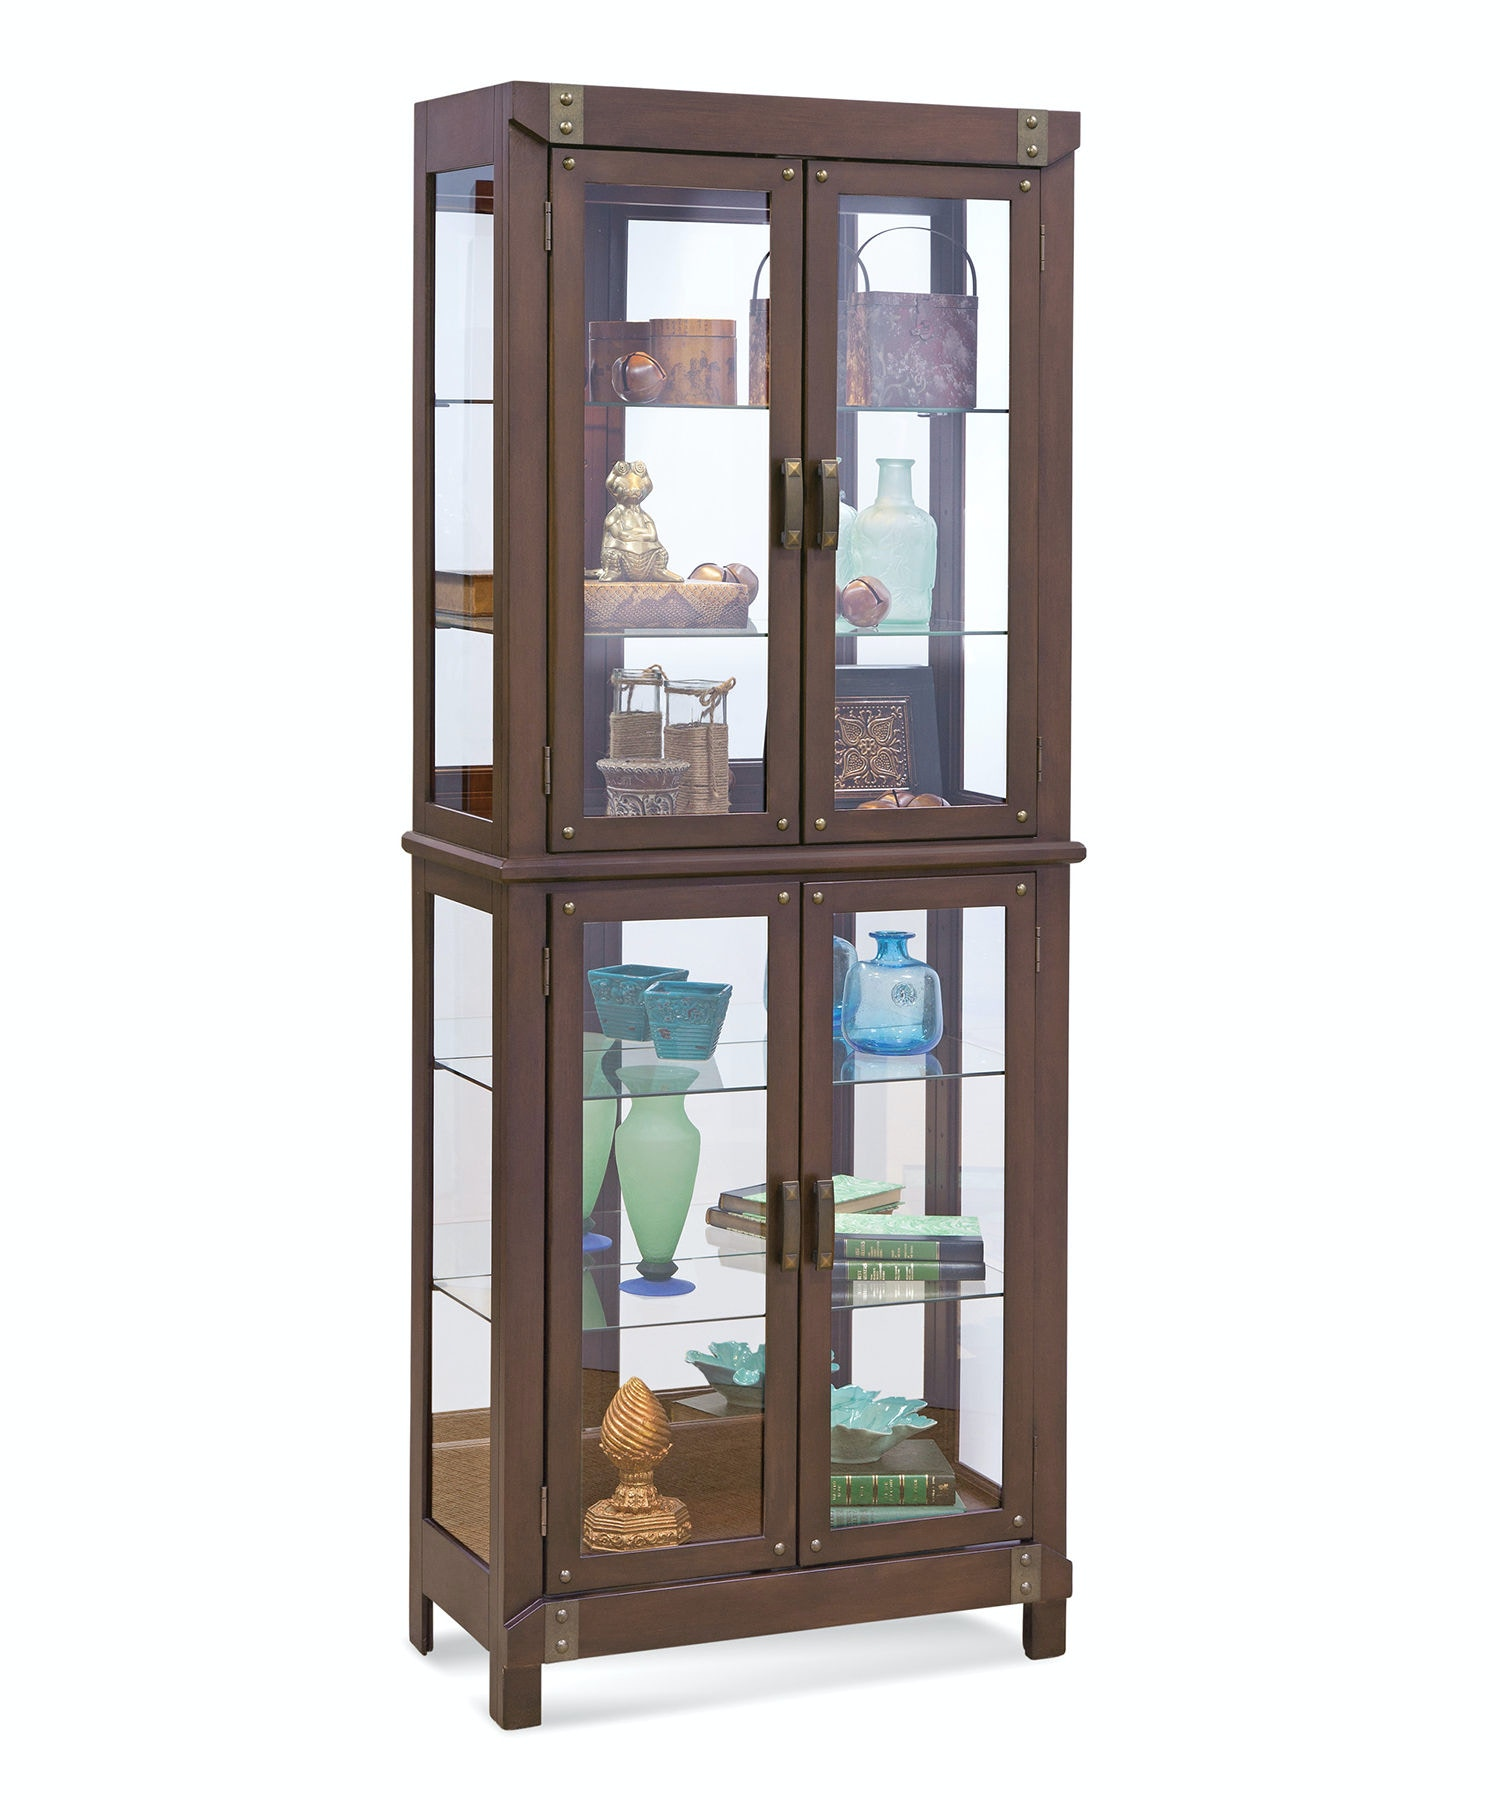 Philip Reinisch Tribeca I Curio Cabinet 765005